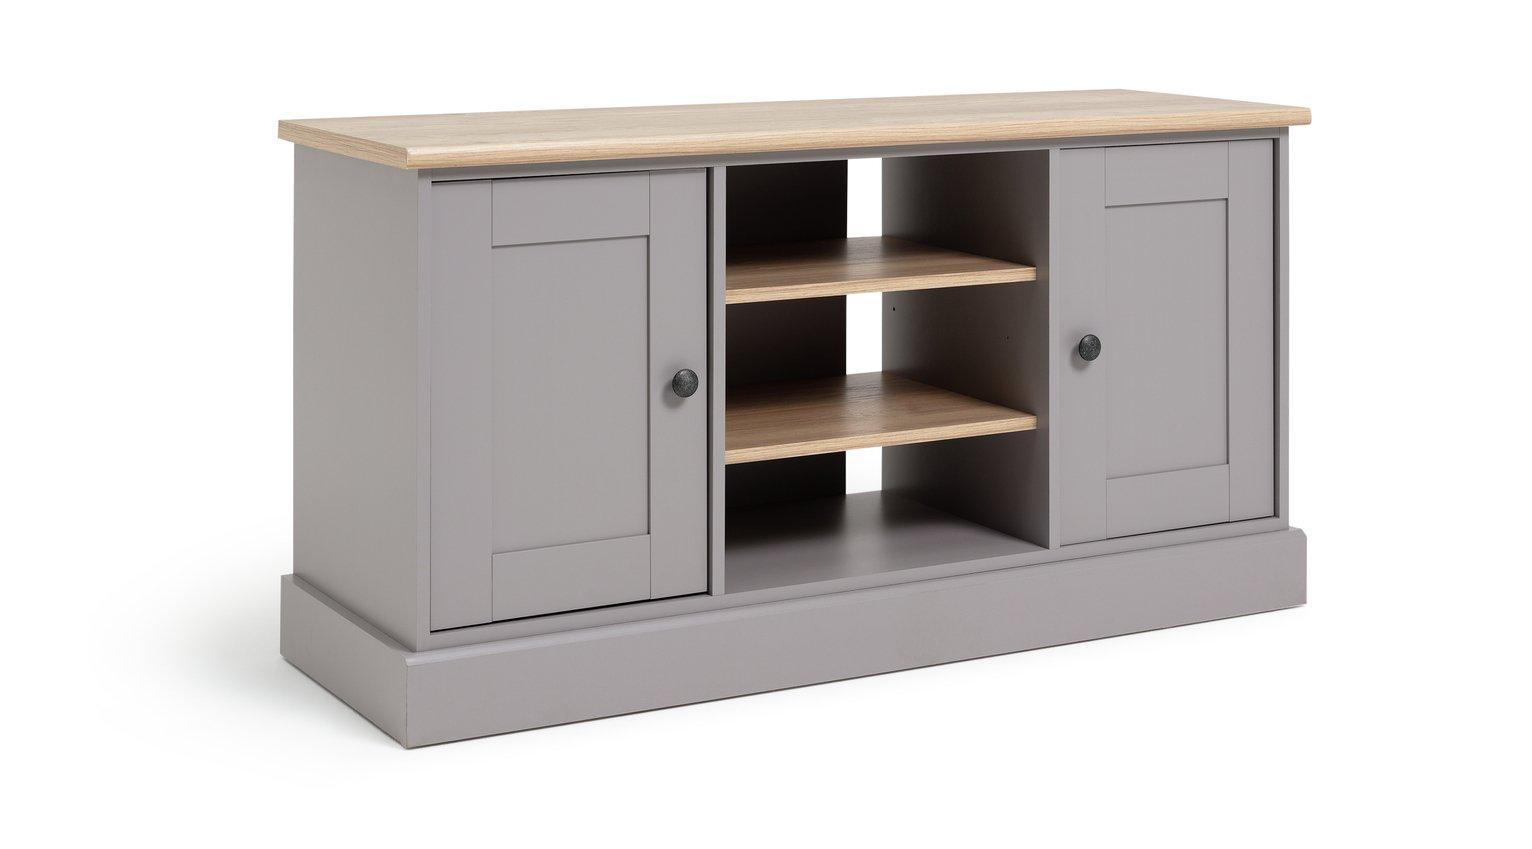 Buy Argos Home Winchester 2 Door Sideboard and TV Unit Grey Sideboards Argos